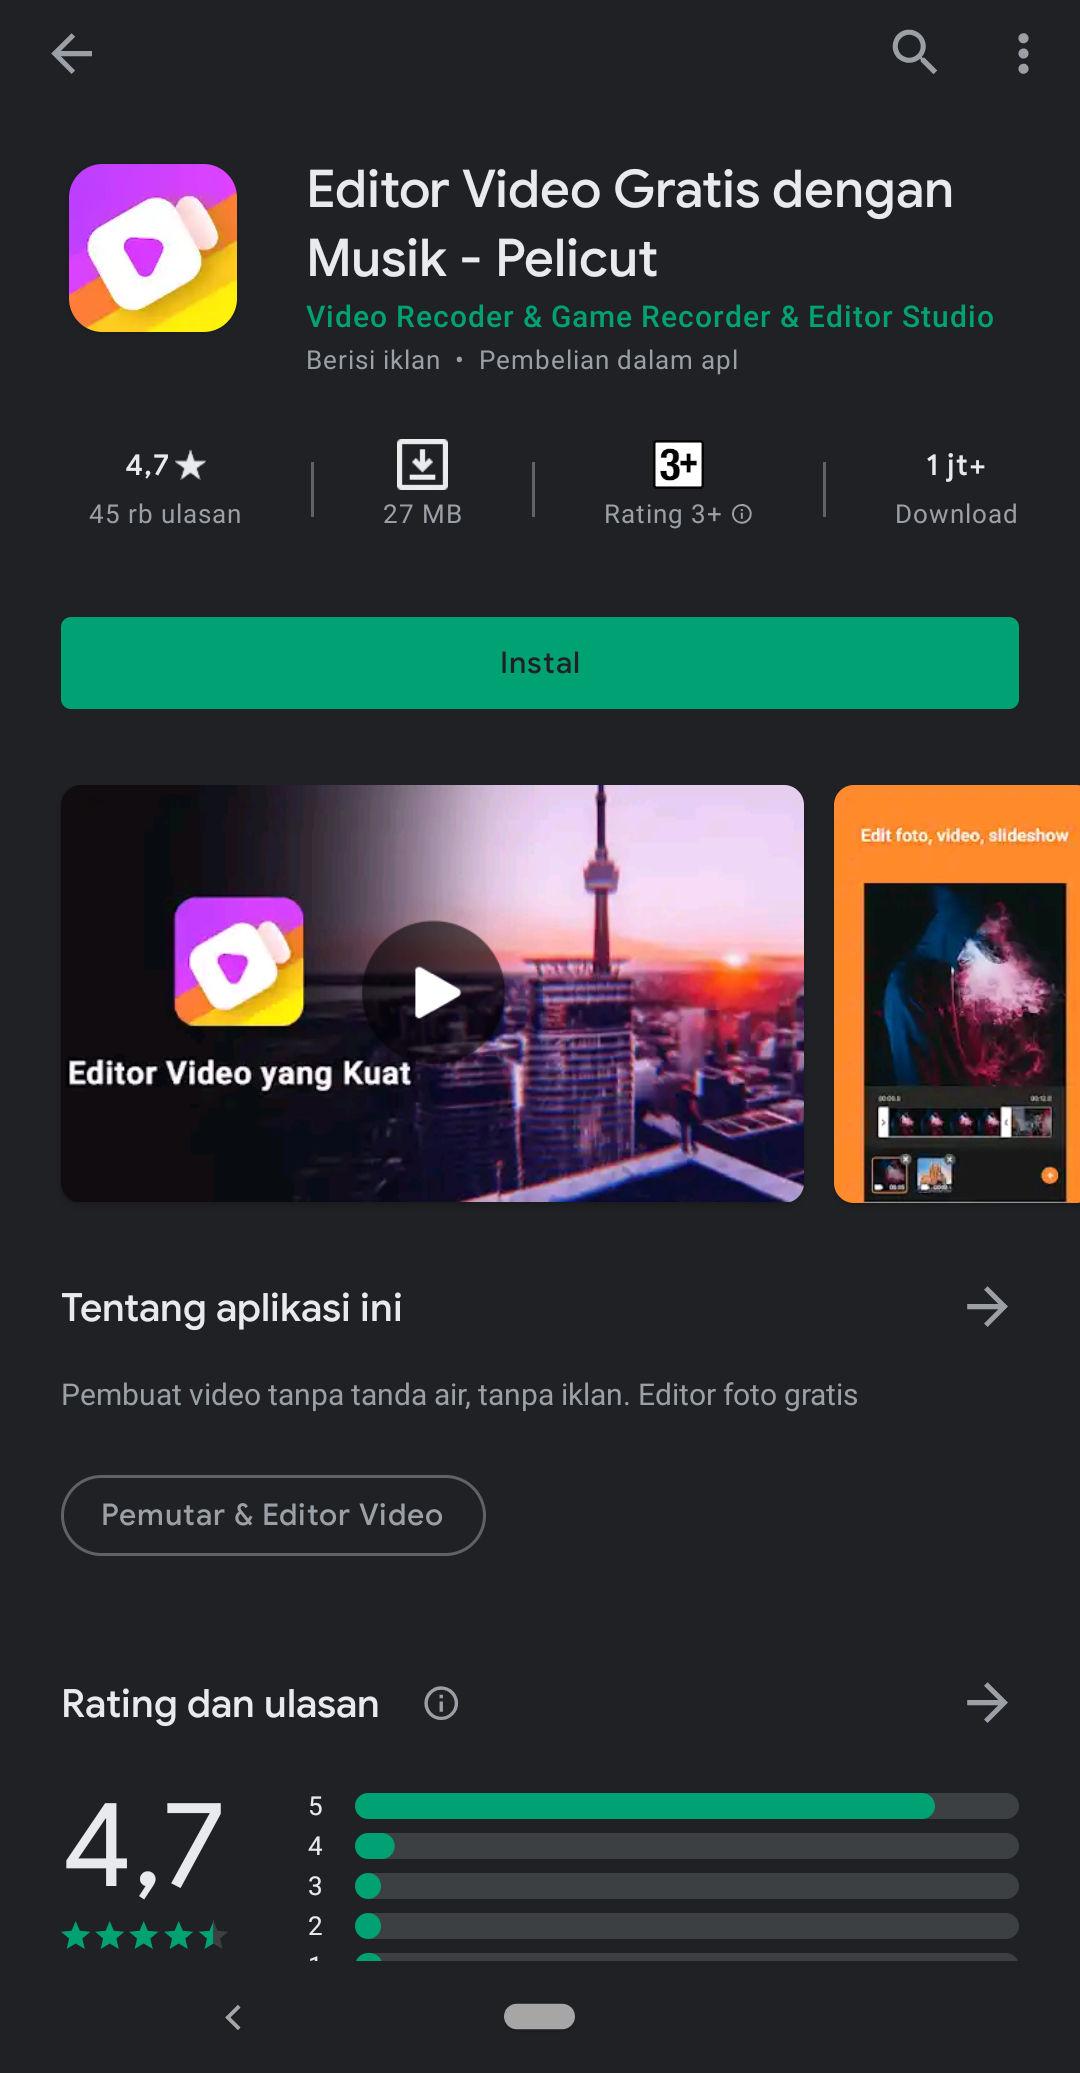 Aplikasi Editor Video Tanpa Watermark Terbaik